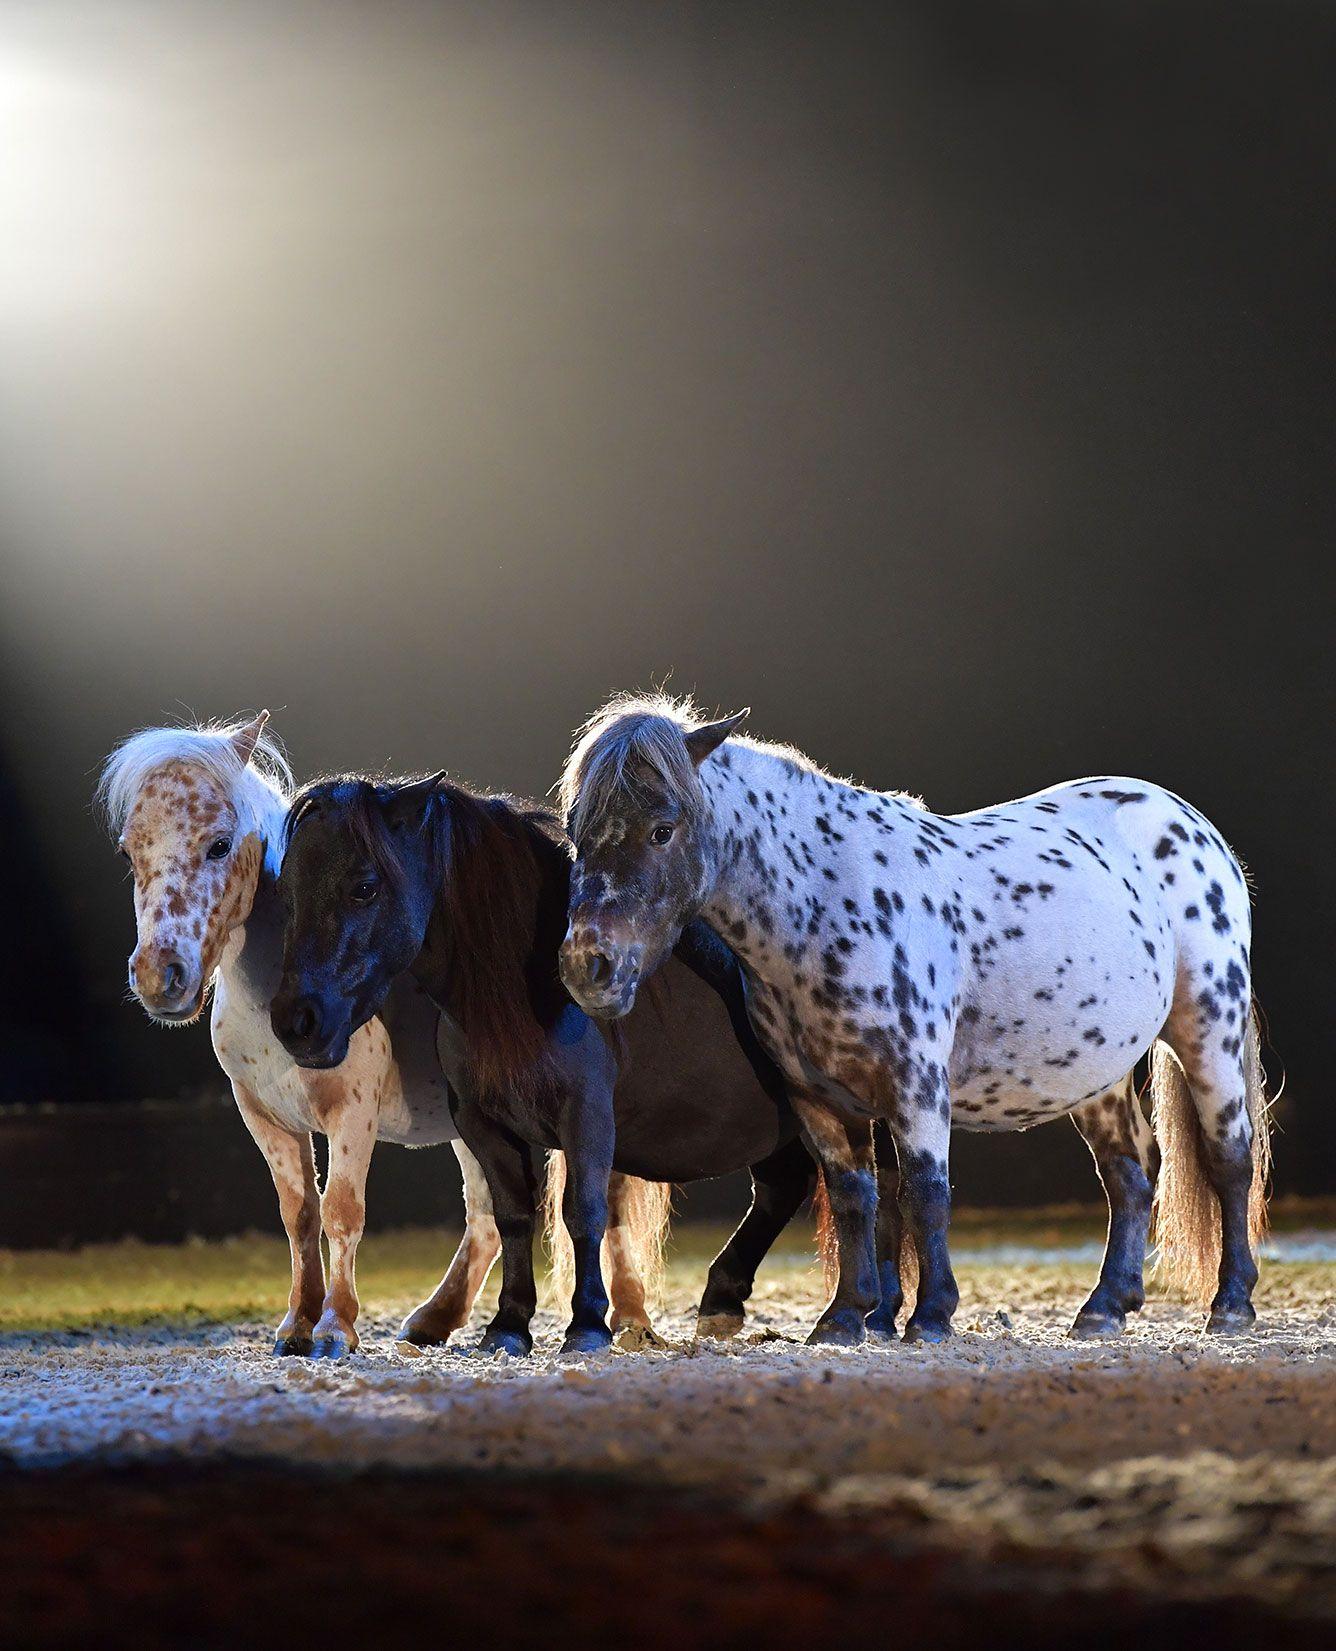 Drei Niedliche Mini Shettys Die In Der Neuen Apassionata Show Cinema Of Dreams In Der Freiheitsdressur Das Publi Eventing Horses Horses Barrel Racing Horses